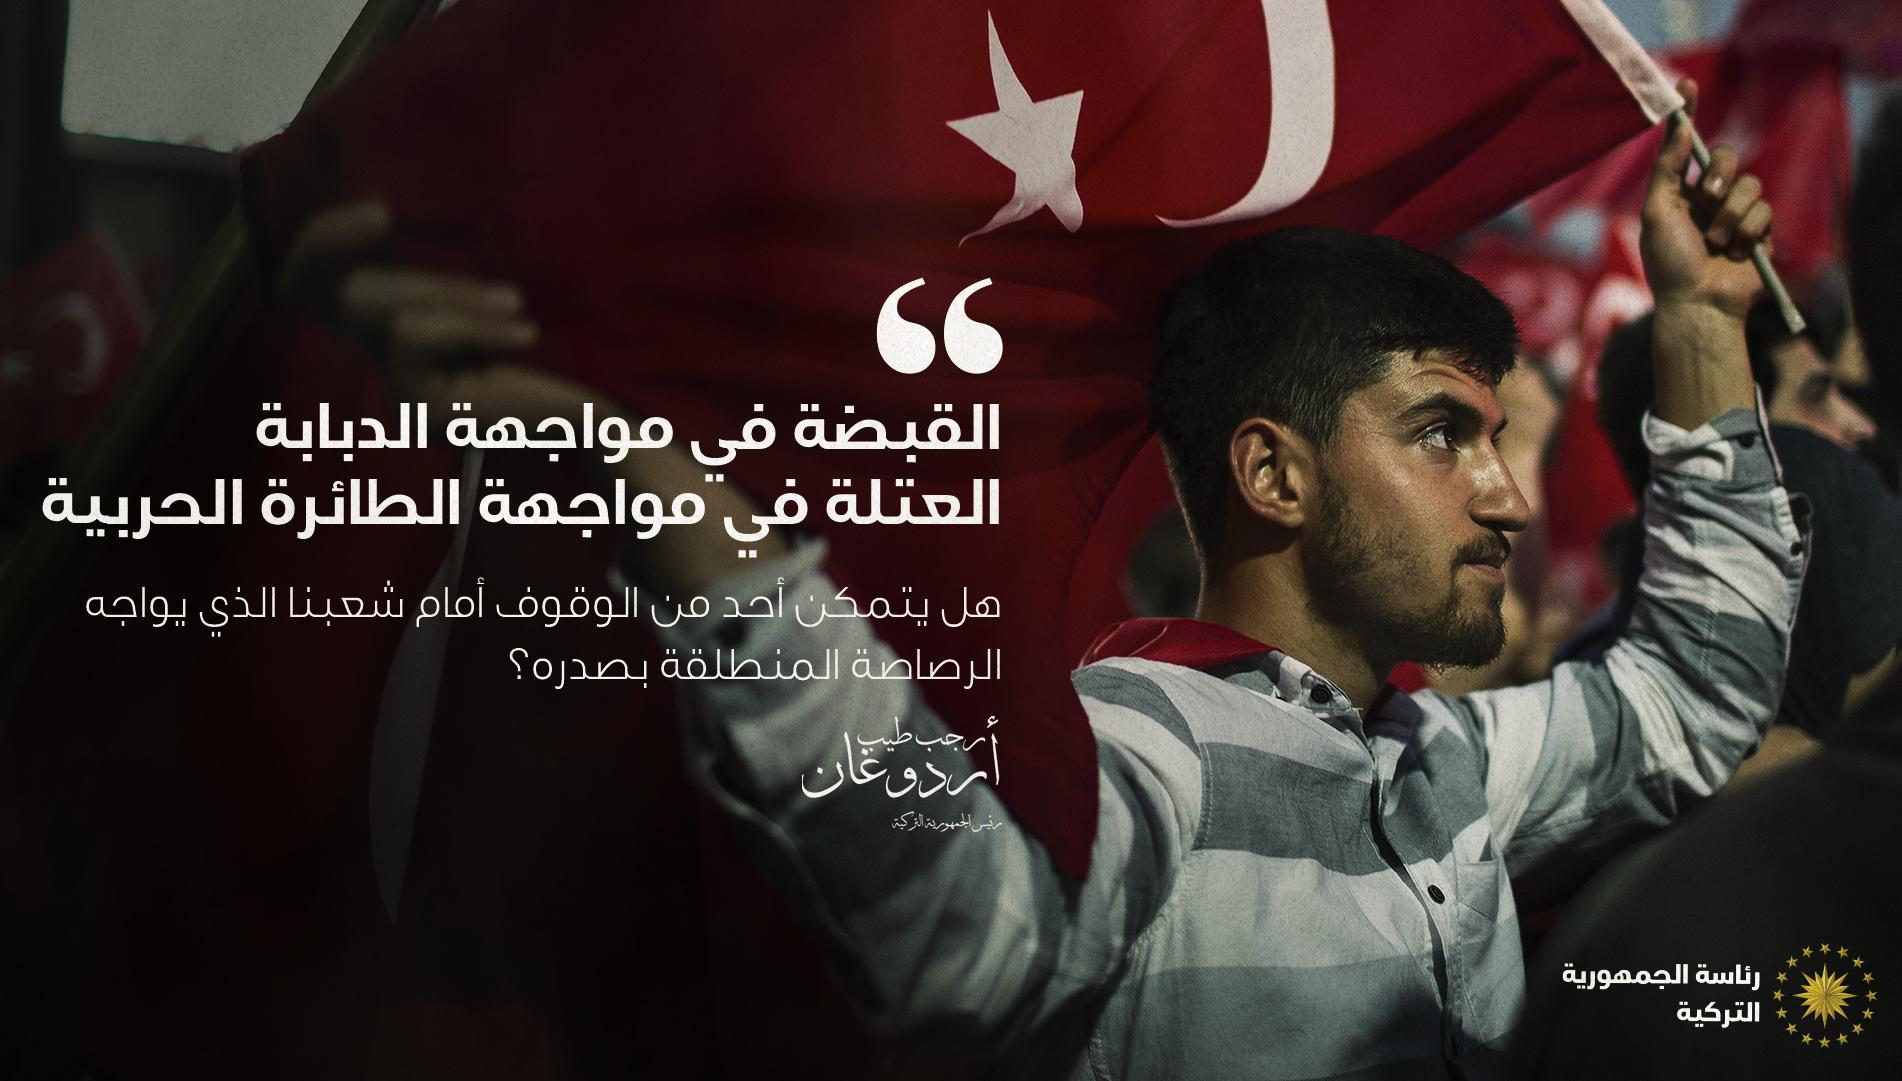 Ec bOchXYAAAn0q - الرئيس التركي يغرد على حسابه الشخصي بمناسبة ذكرى 15 تموز